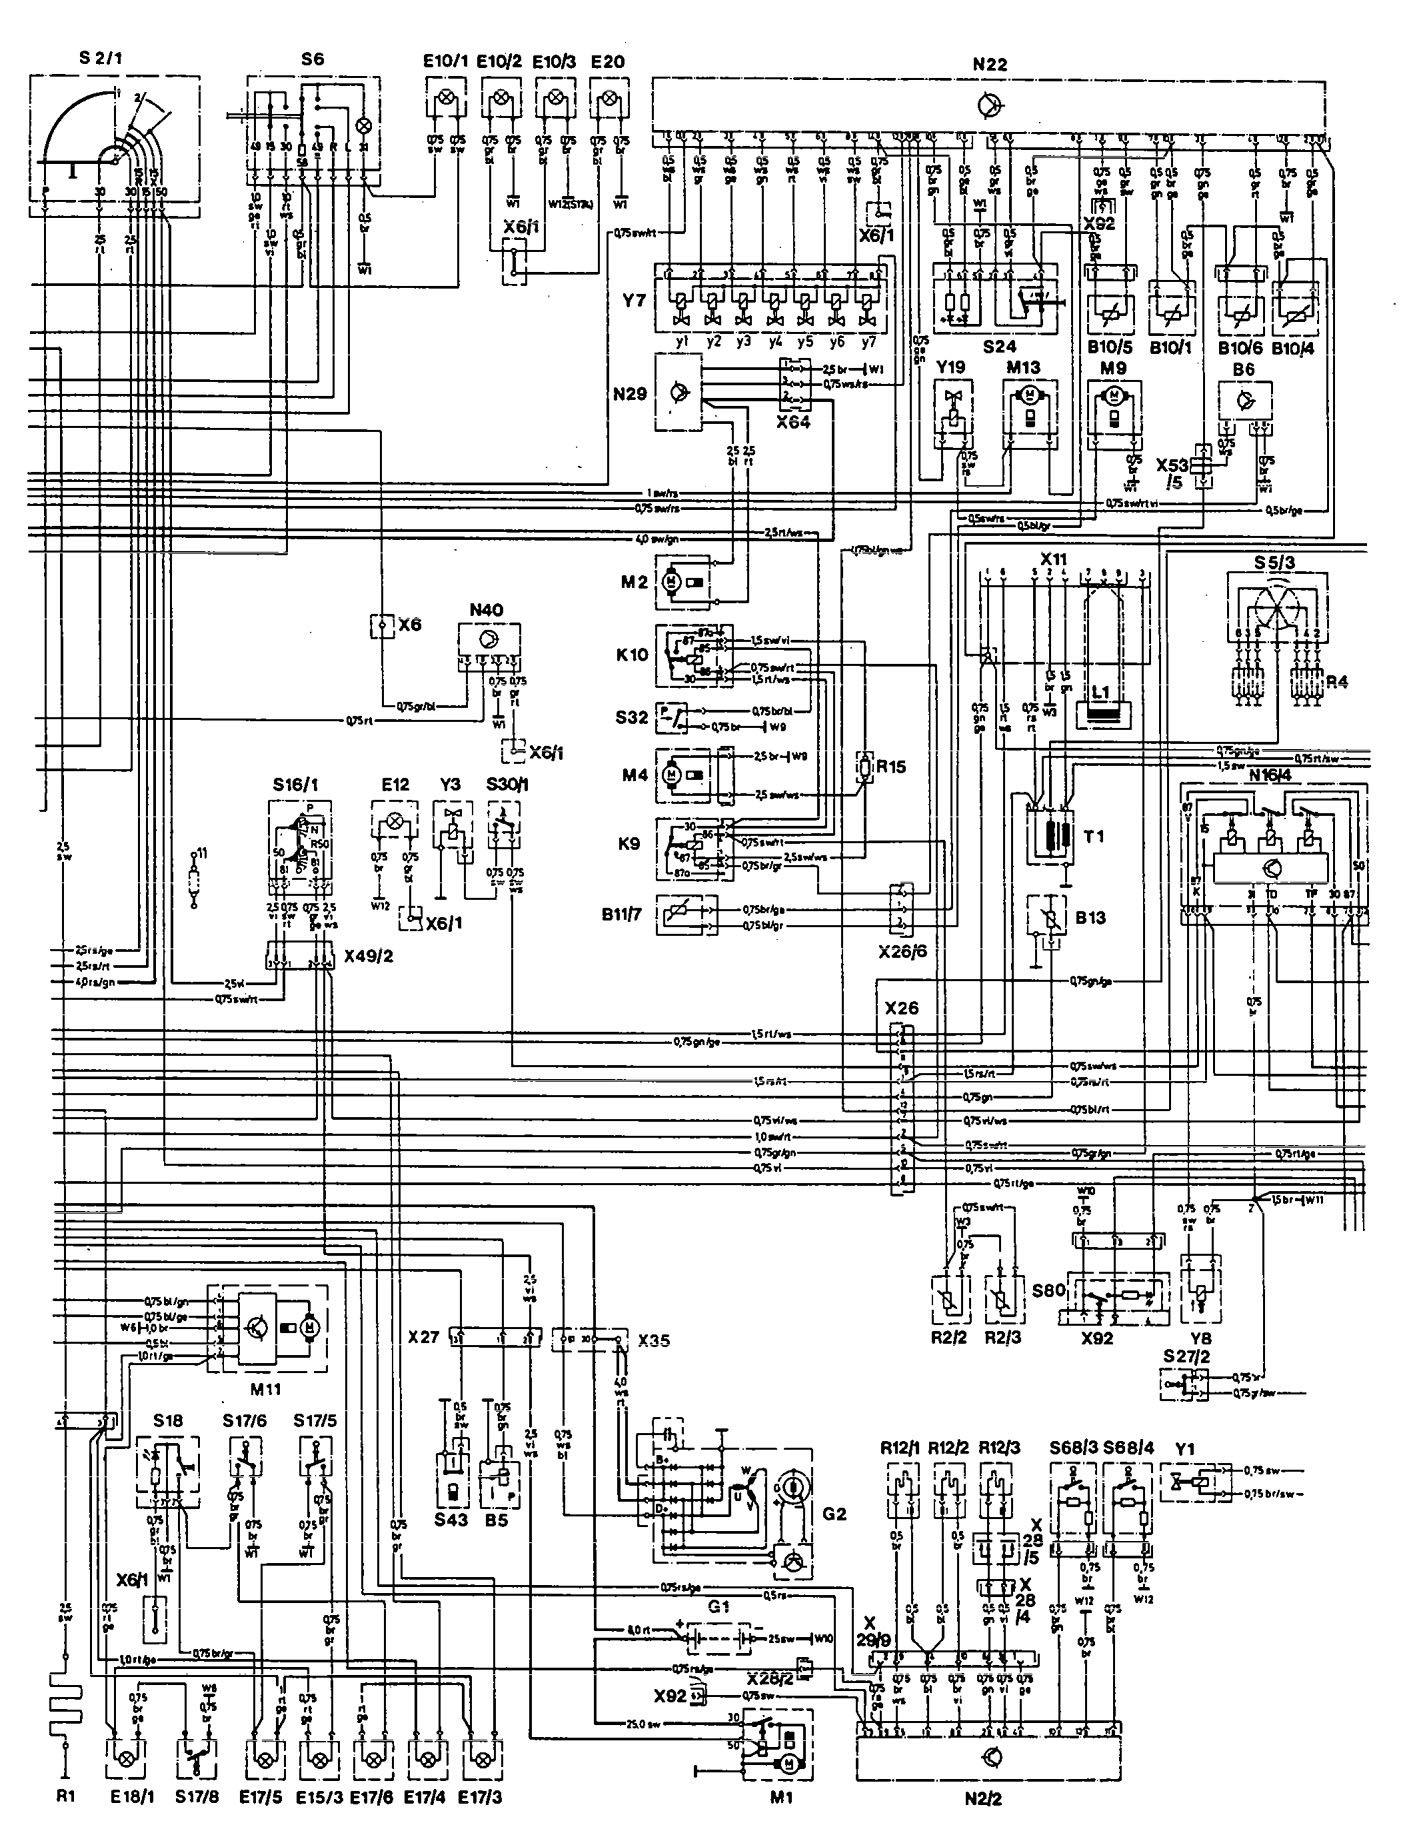 1991 mercedes 300e fuse box 1991 mercedes e300 wiring